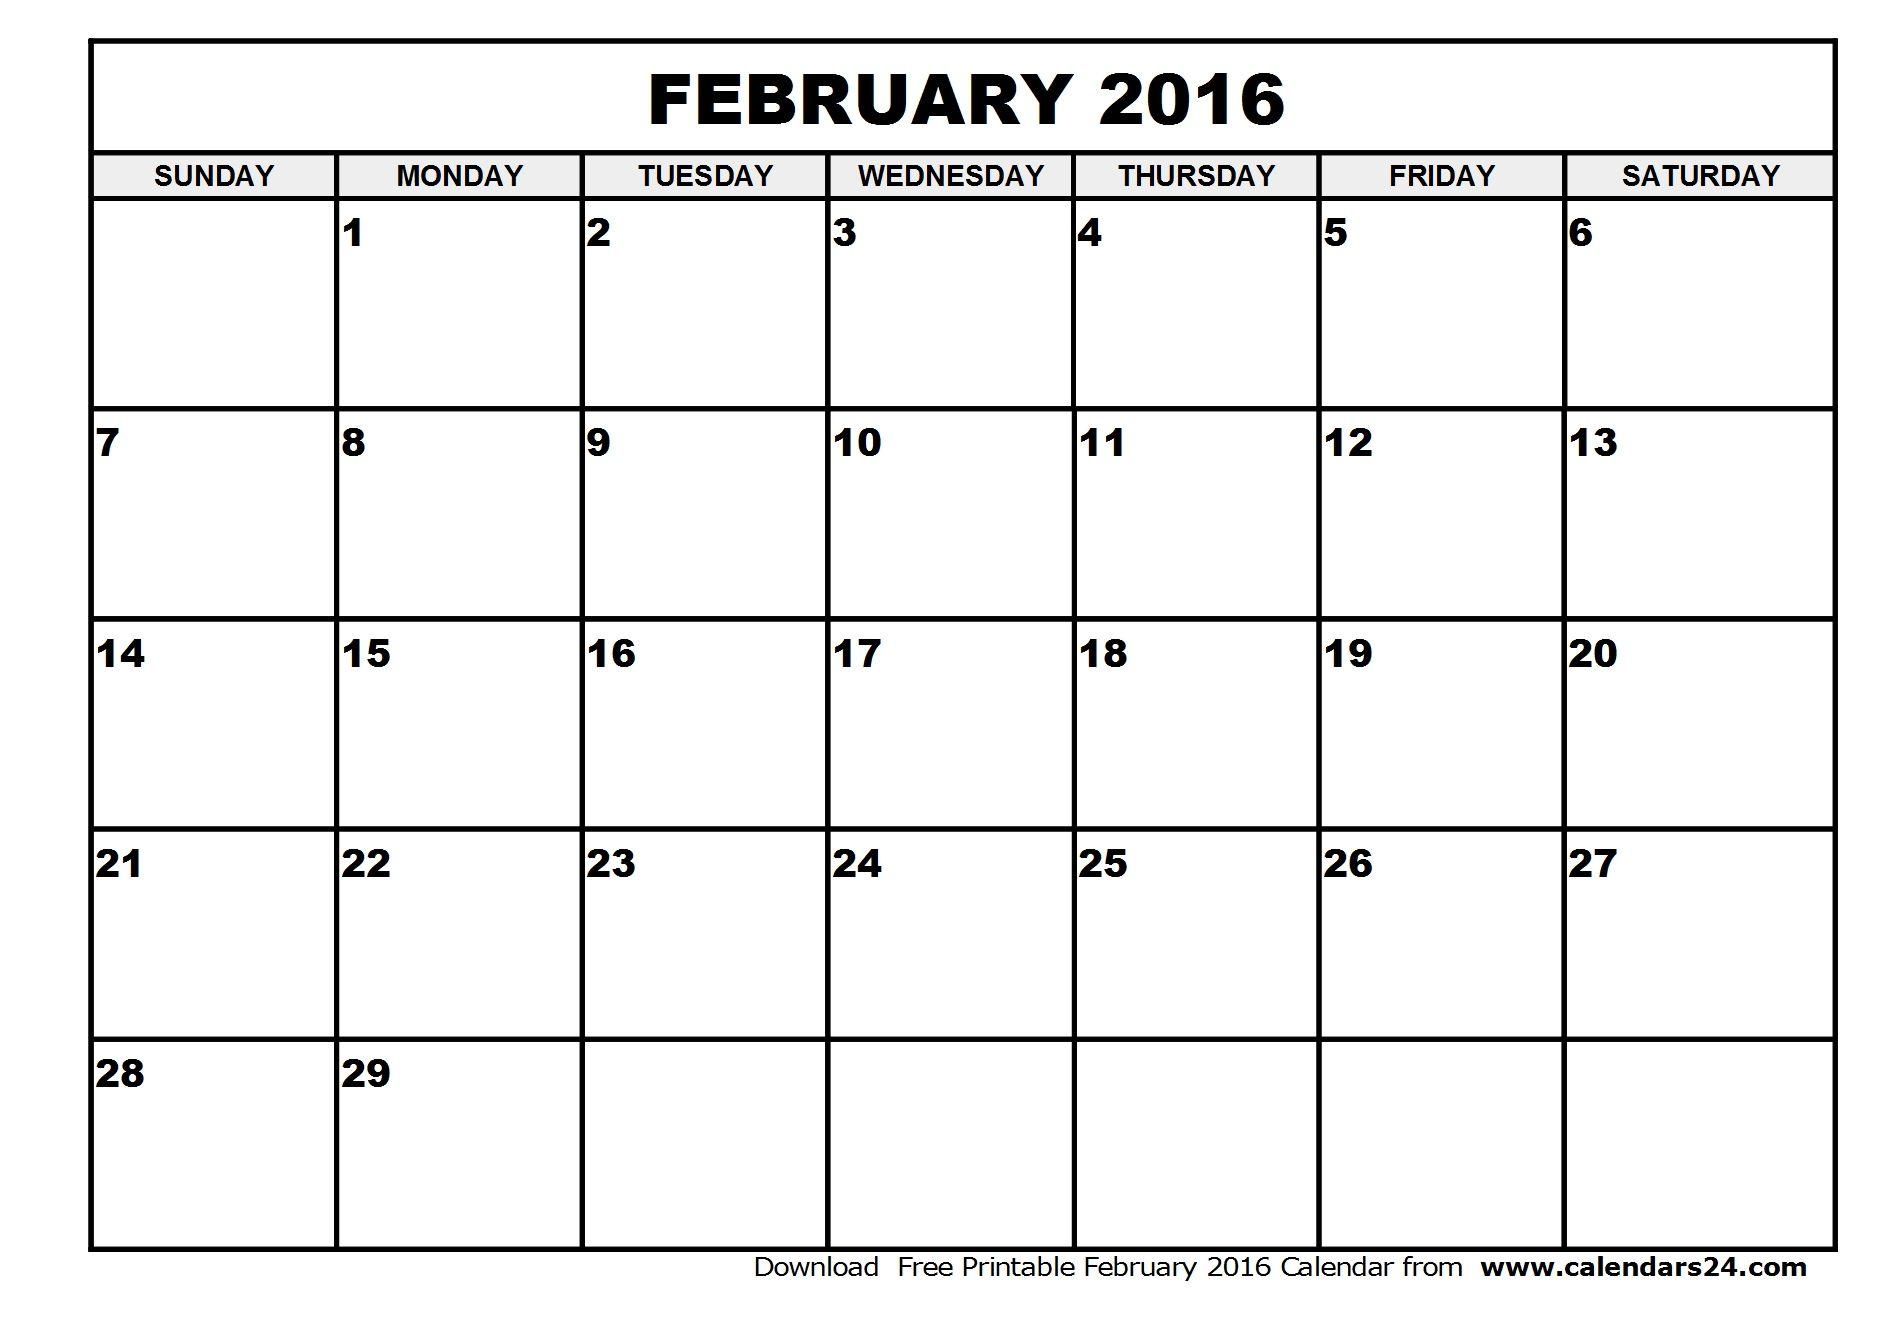 February 2016 Calendar Amp March 2016 Calendar August Calendar